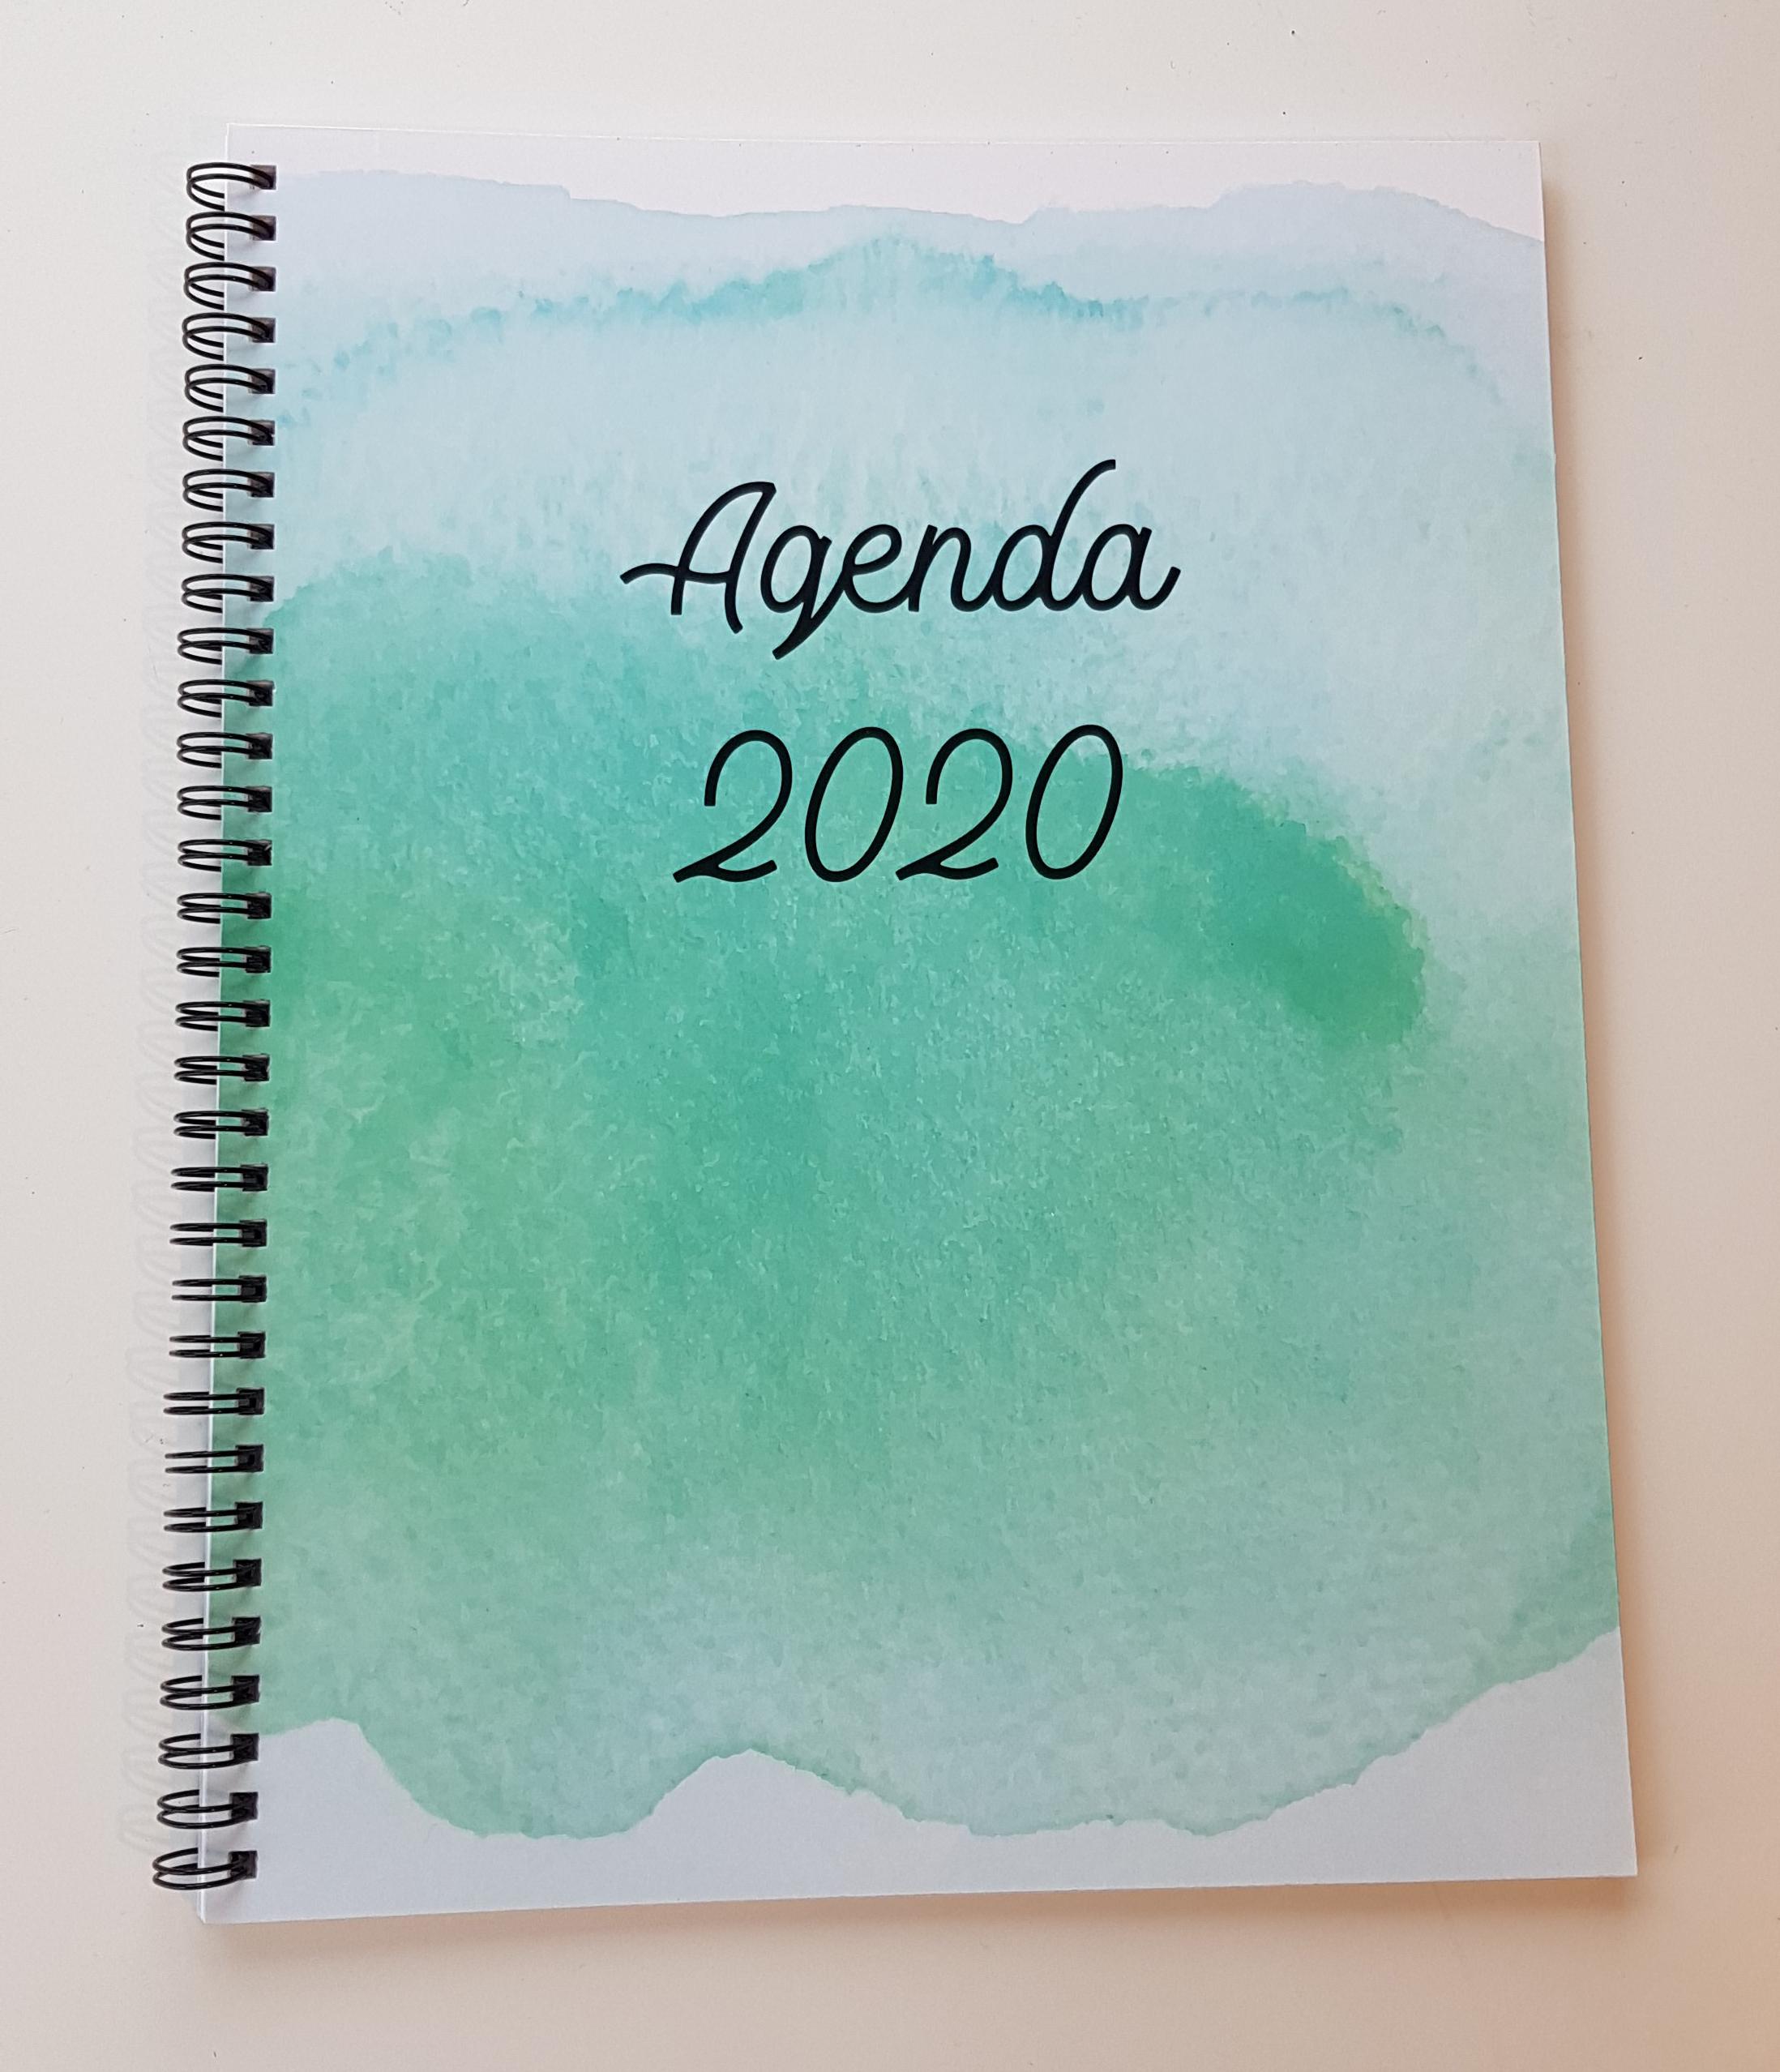 création montage et impression agenda 2020